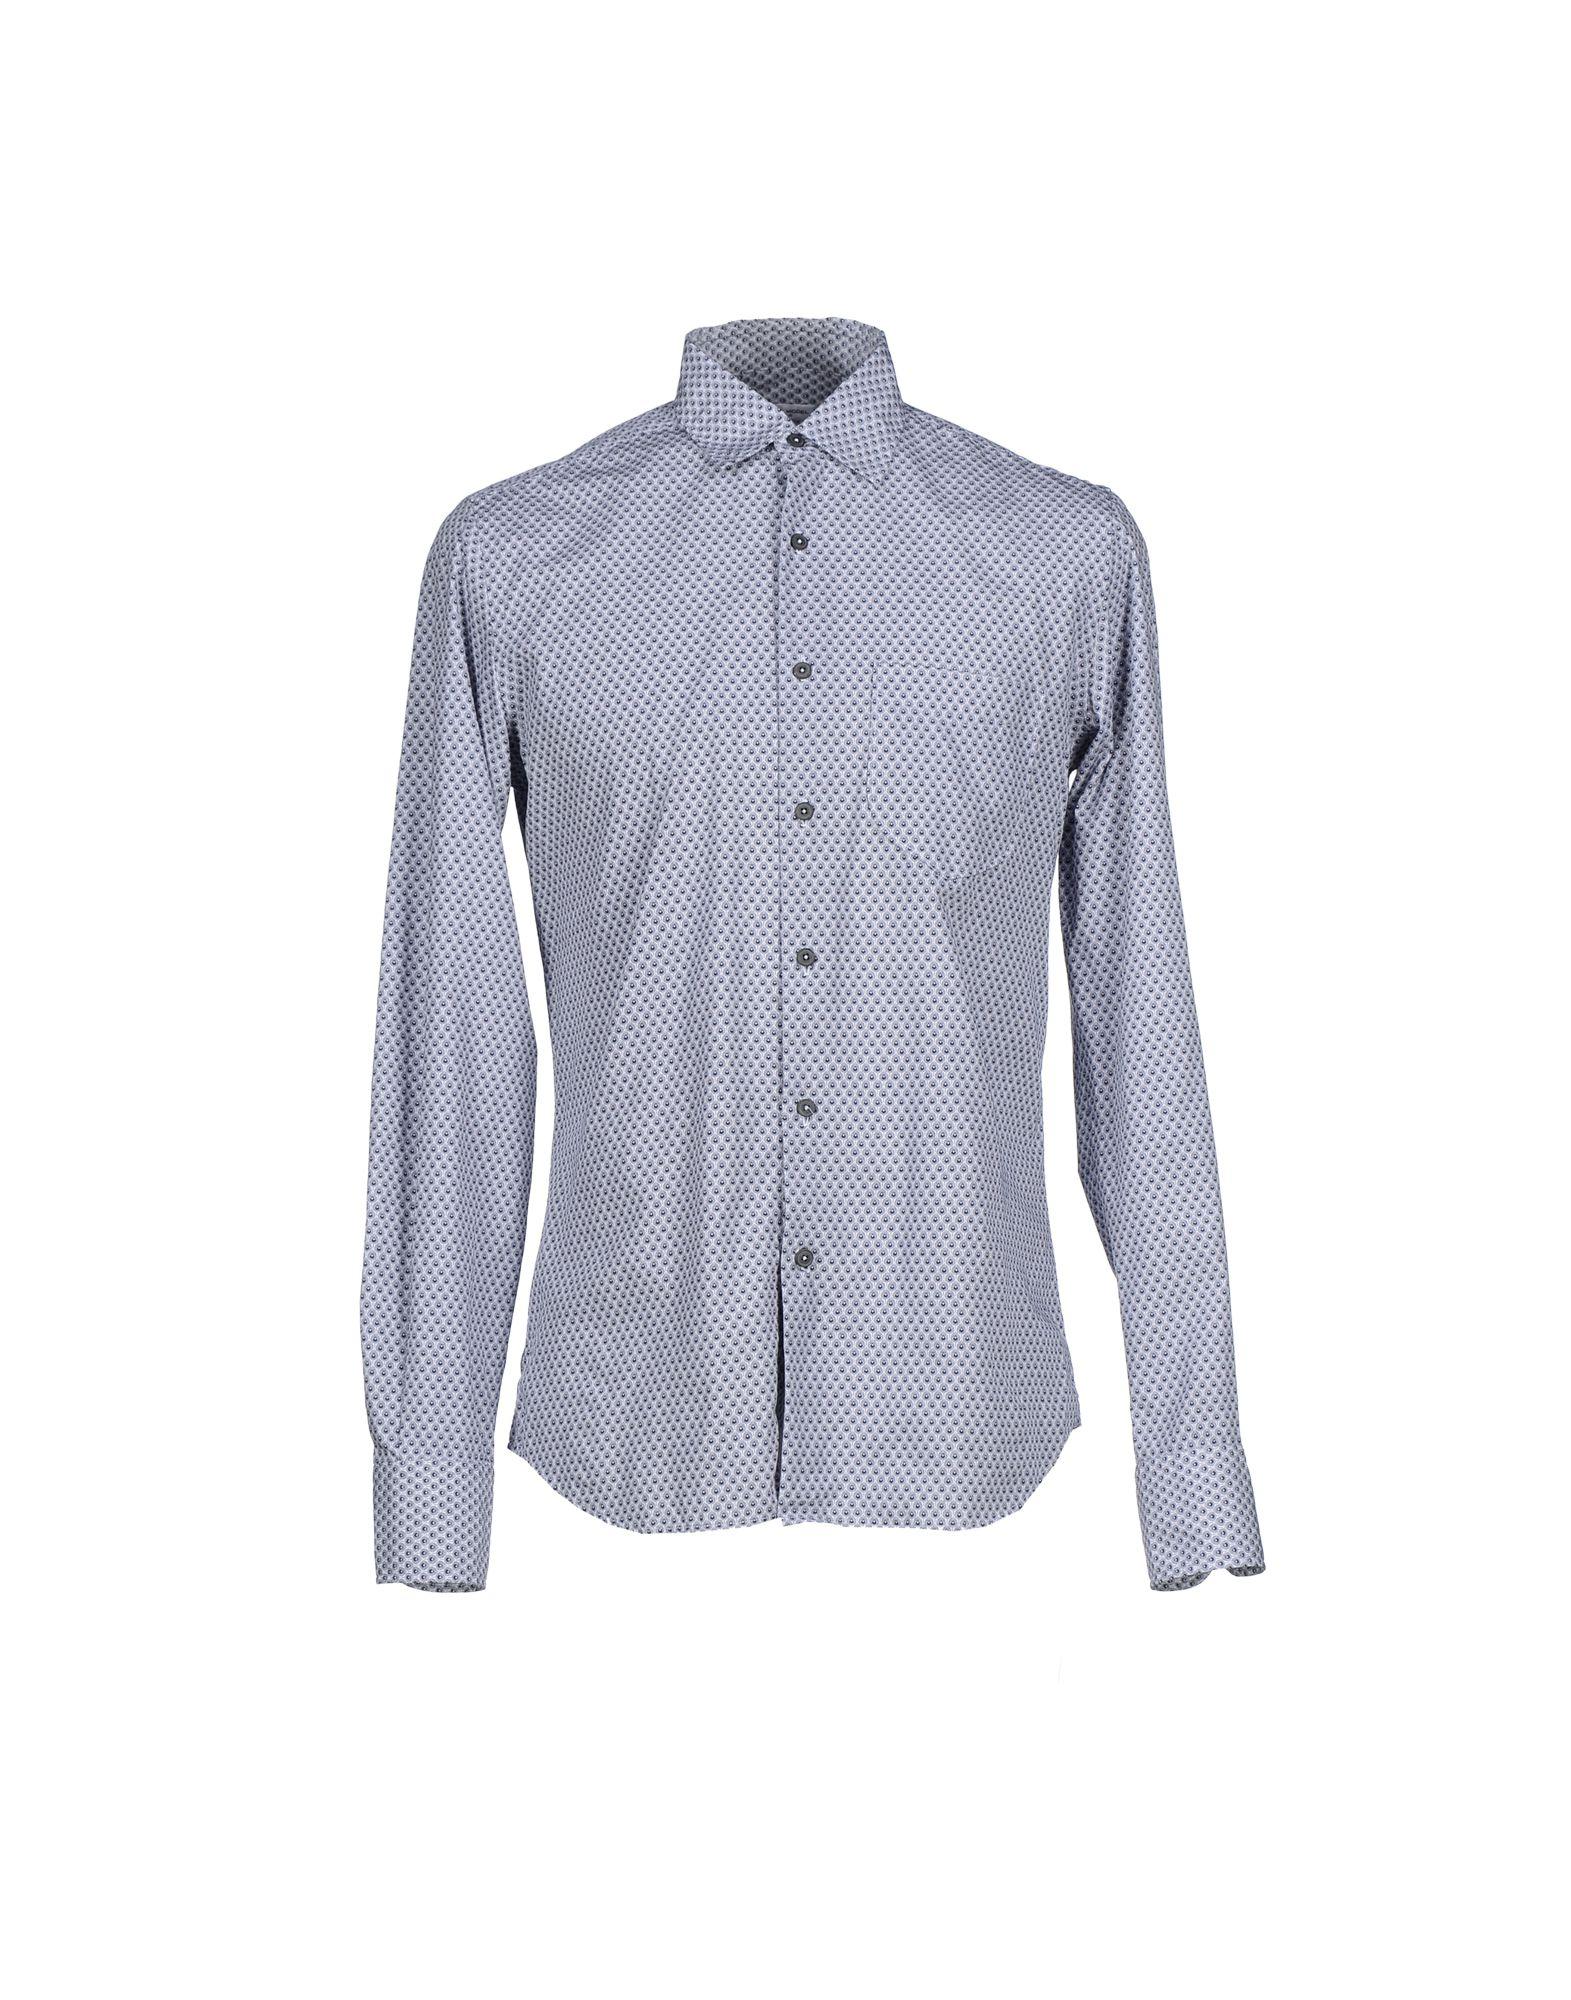 'Philippe Model Shirts